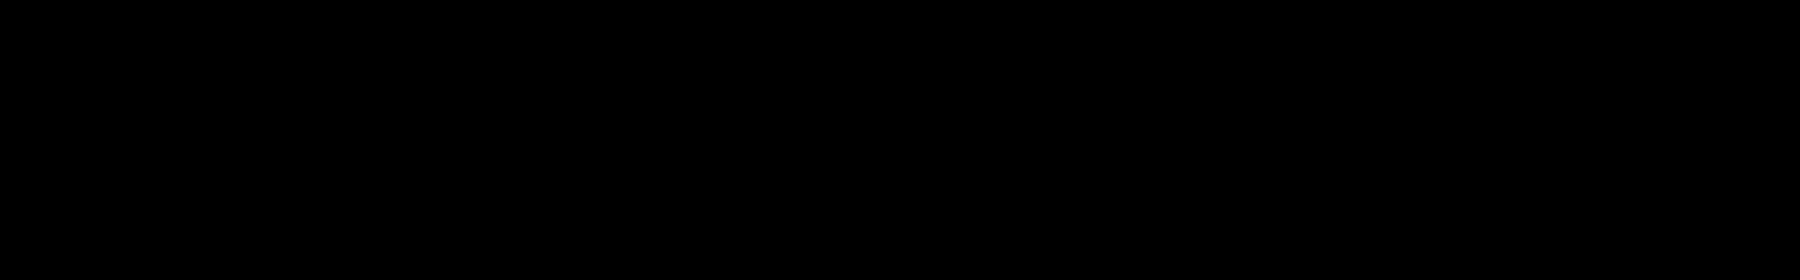 Ultra Moombahton Elements Vol.1 audio waveform